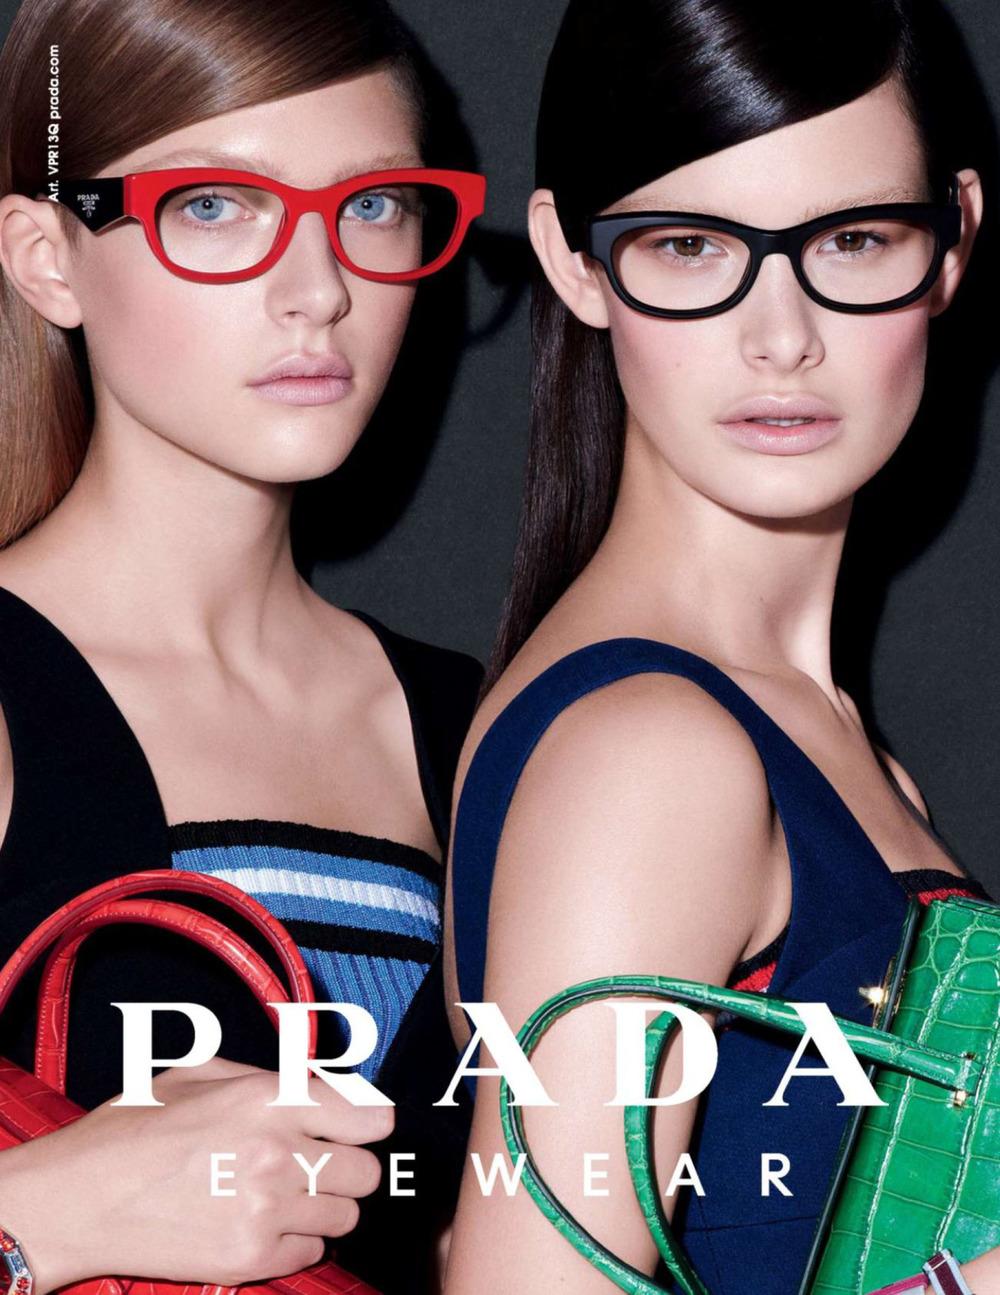 Prada-Eyewear-ad-advertisiment-campaign-spring-2014-03.jpg